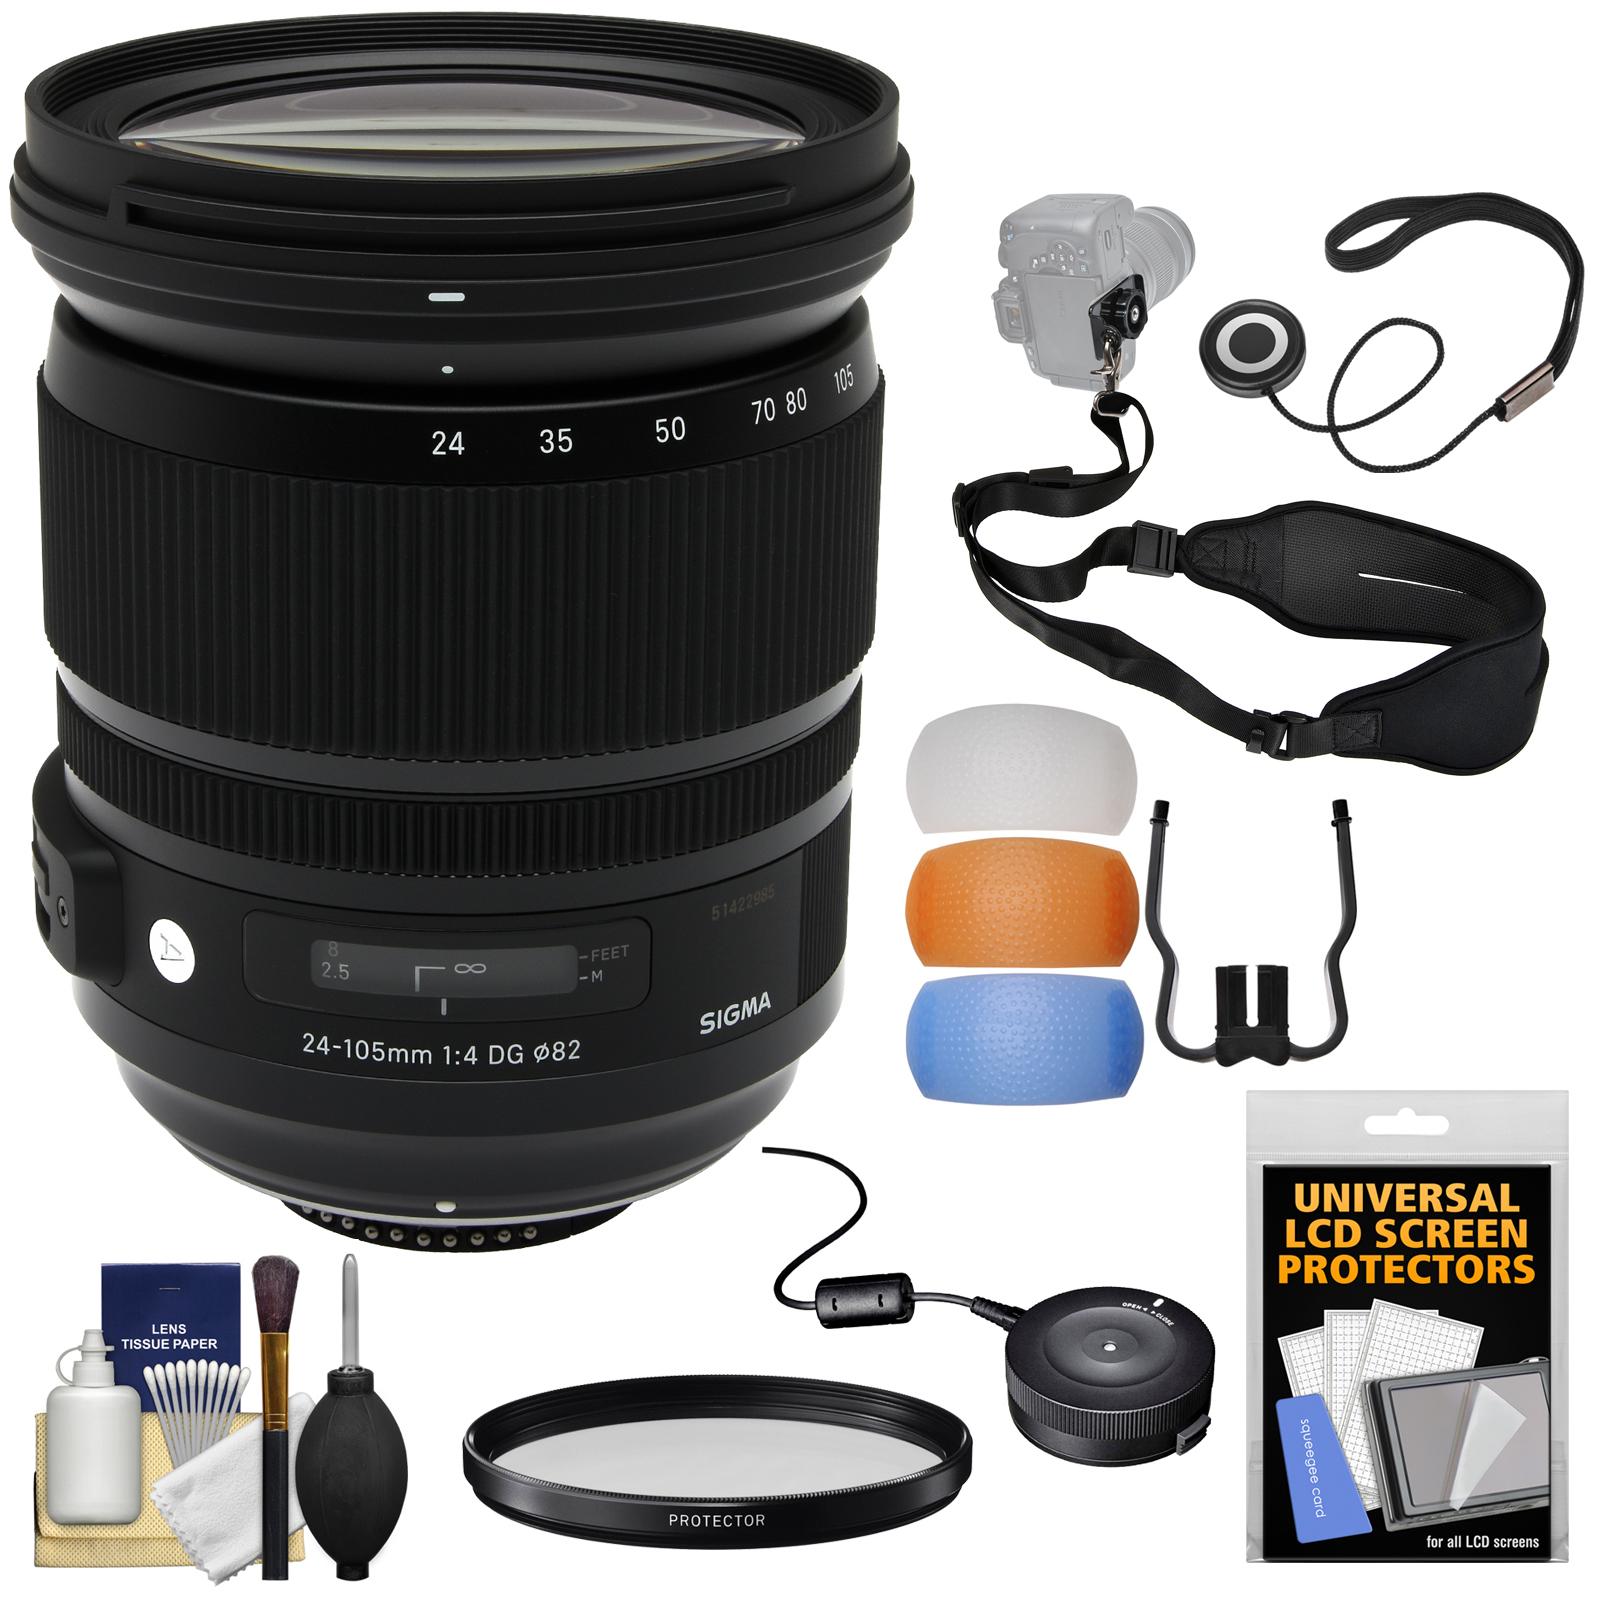 Sigma 24-105mm f/4.0 ART DG OS HSM Zoom Lens with USB Dock + Filter + Sling Strap + Diffusers + Kit for Nikon Digital SLR Cameras